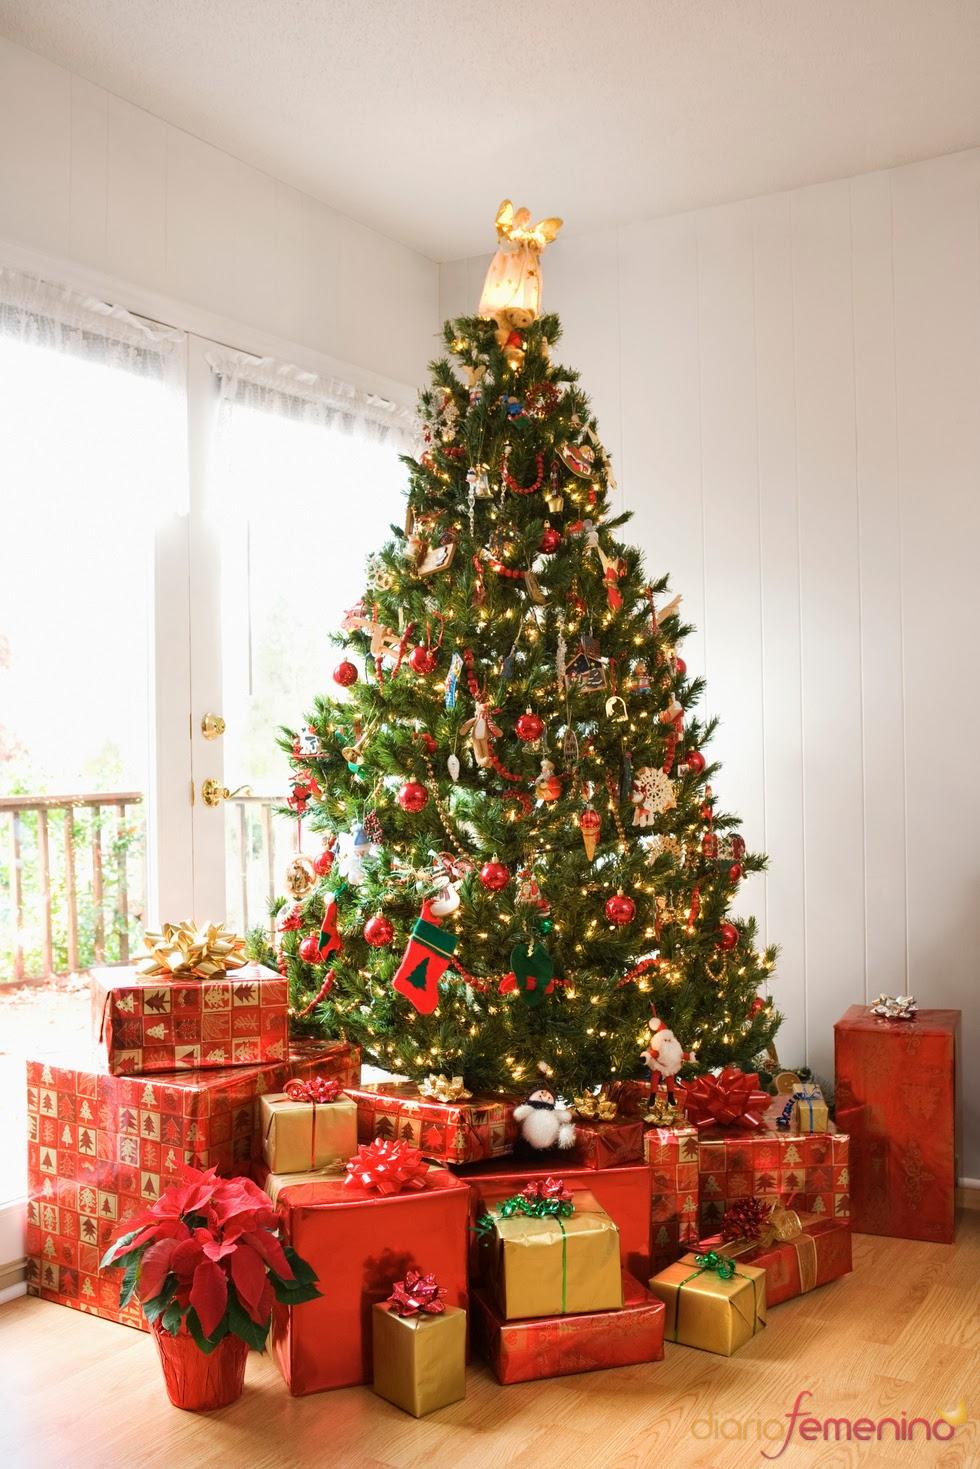 Navidad rbol de navidad - O arbol de navidad ...